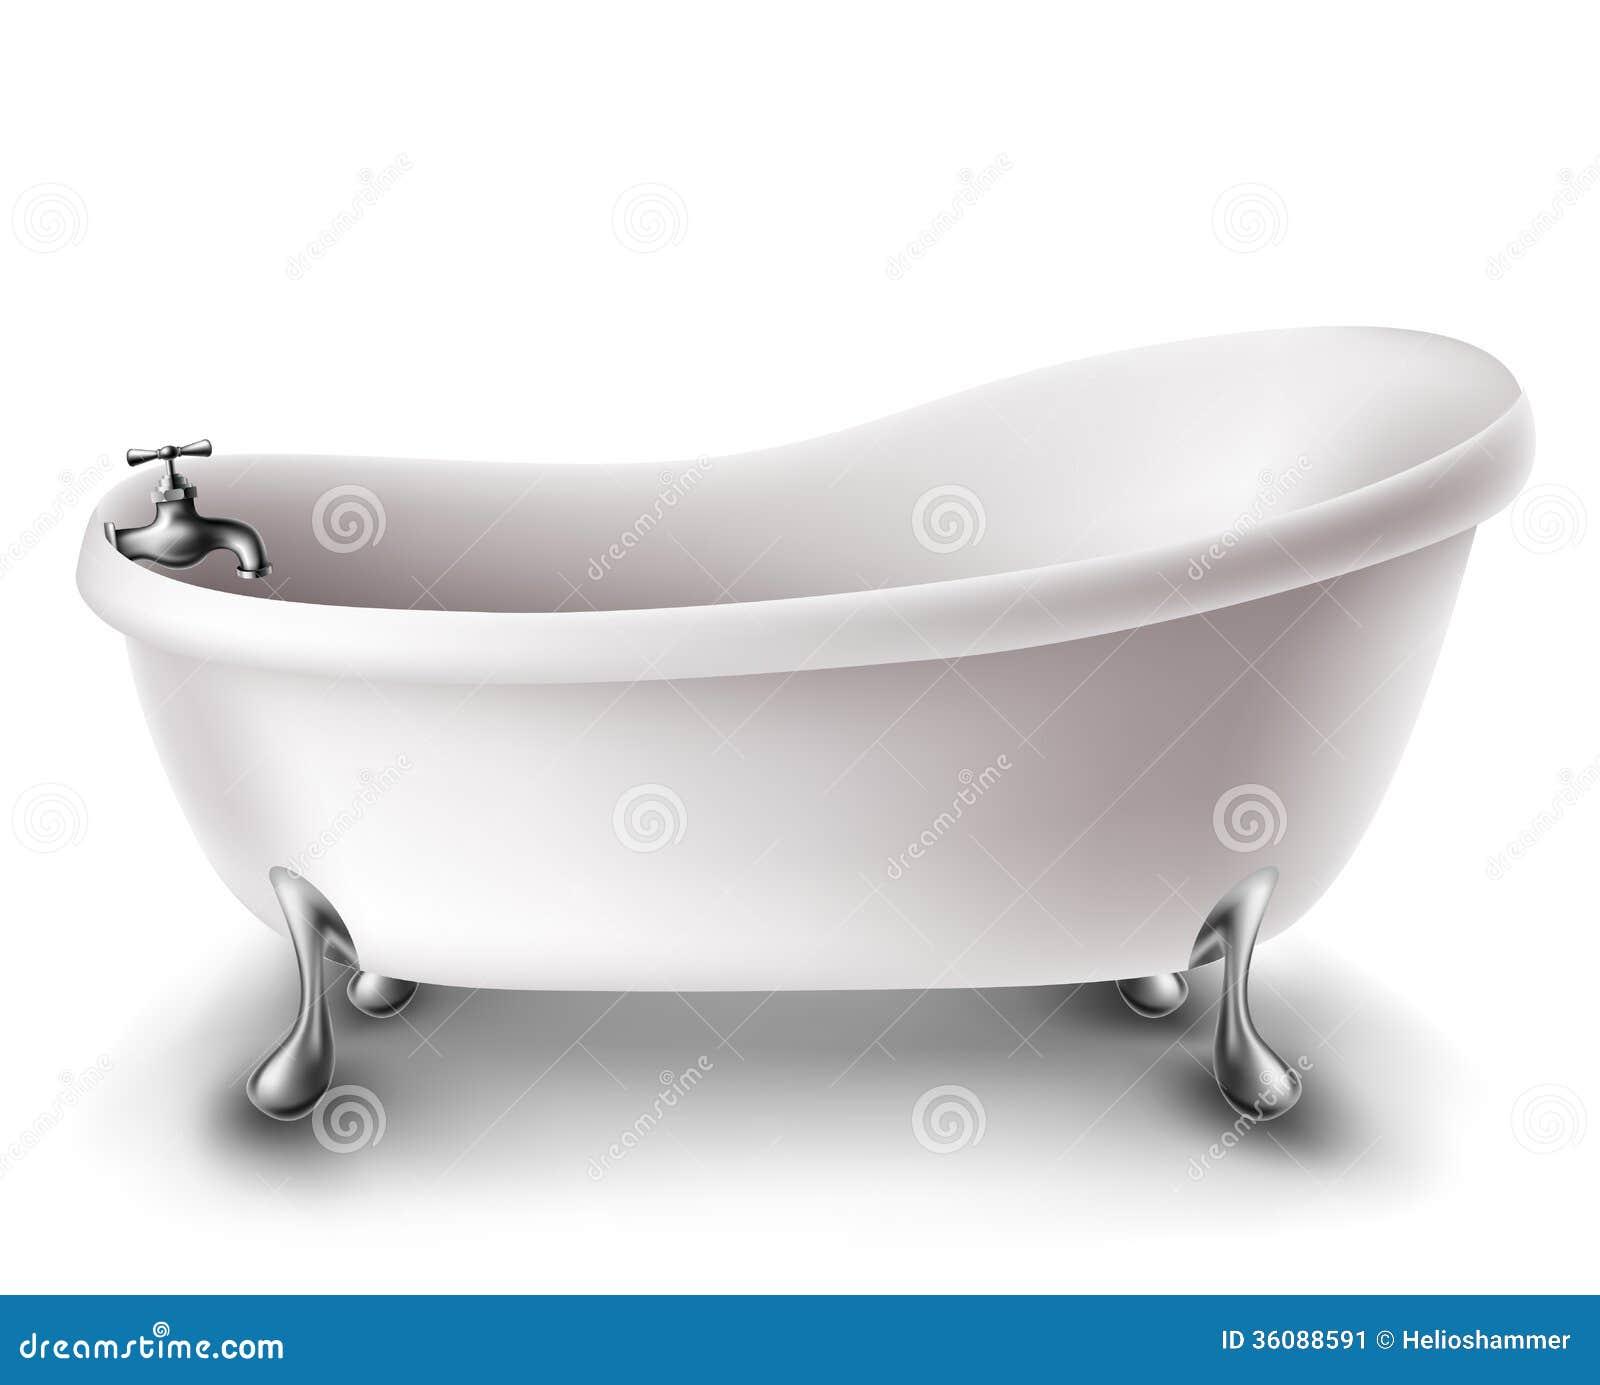 White bathtub stock vector. Illustration of bathtub, iron - 36088591